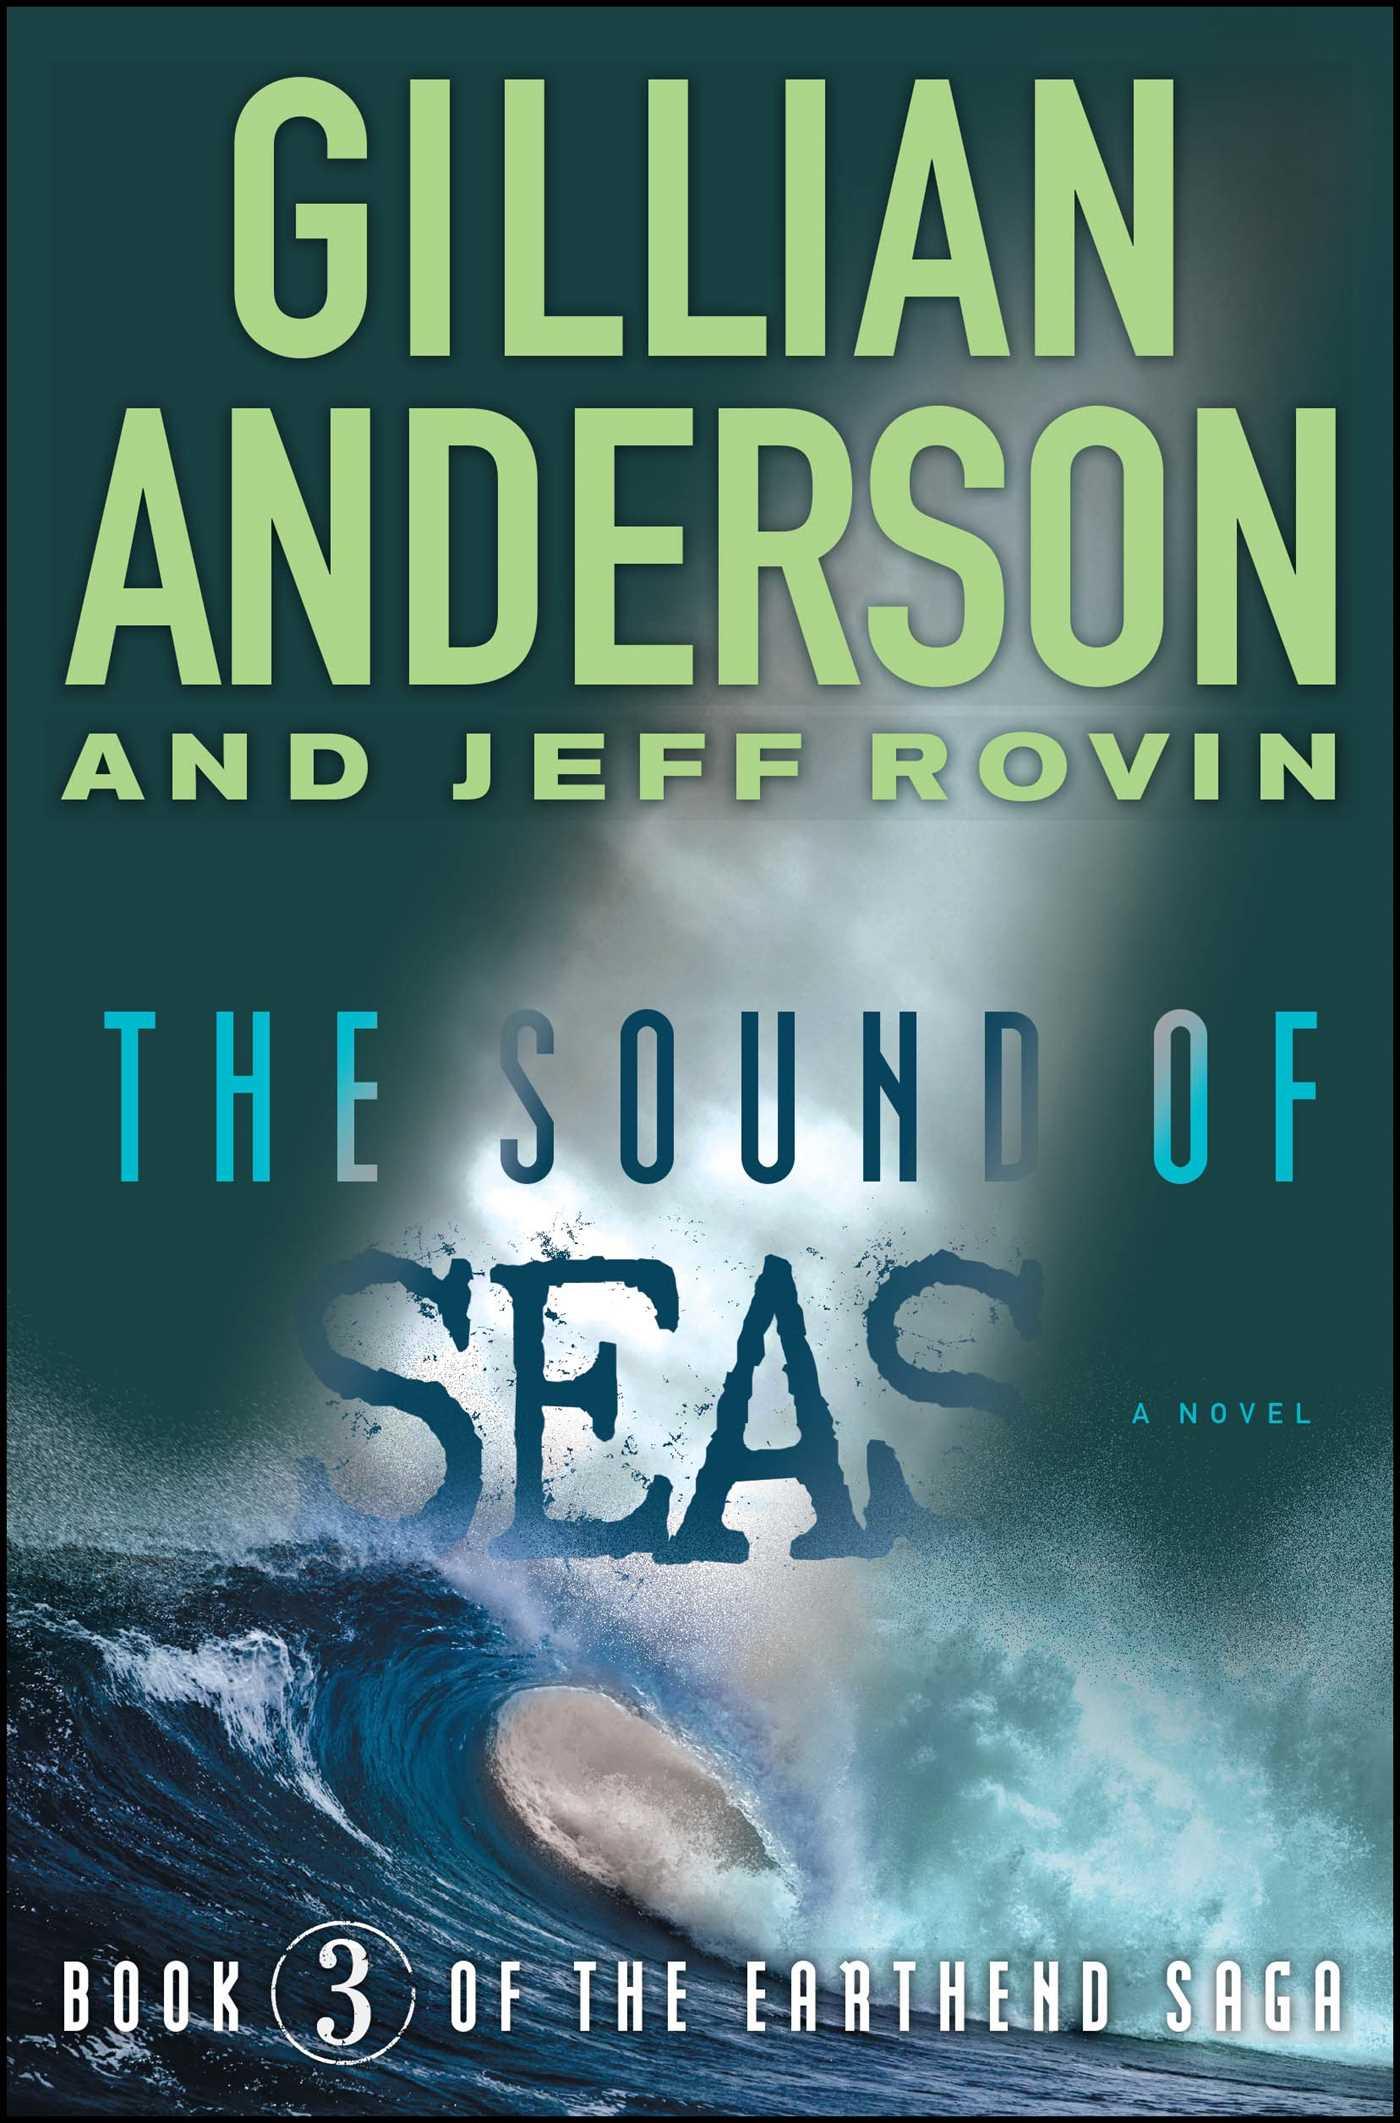 The sound of seas 9781476776606 hr